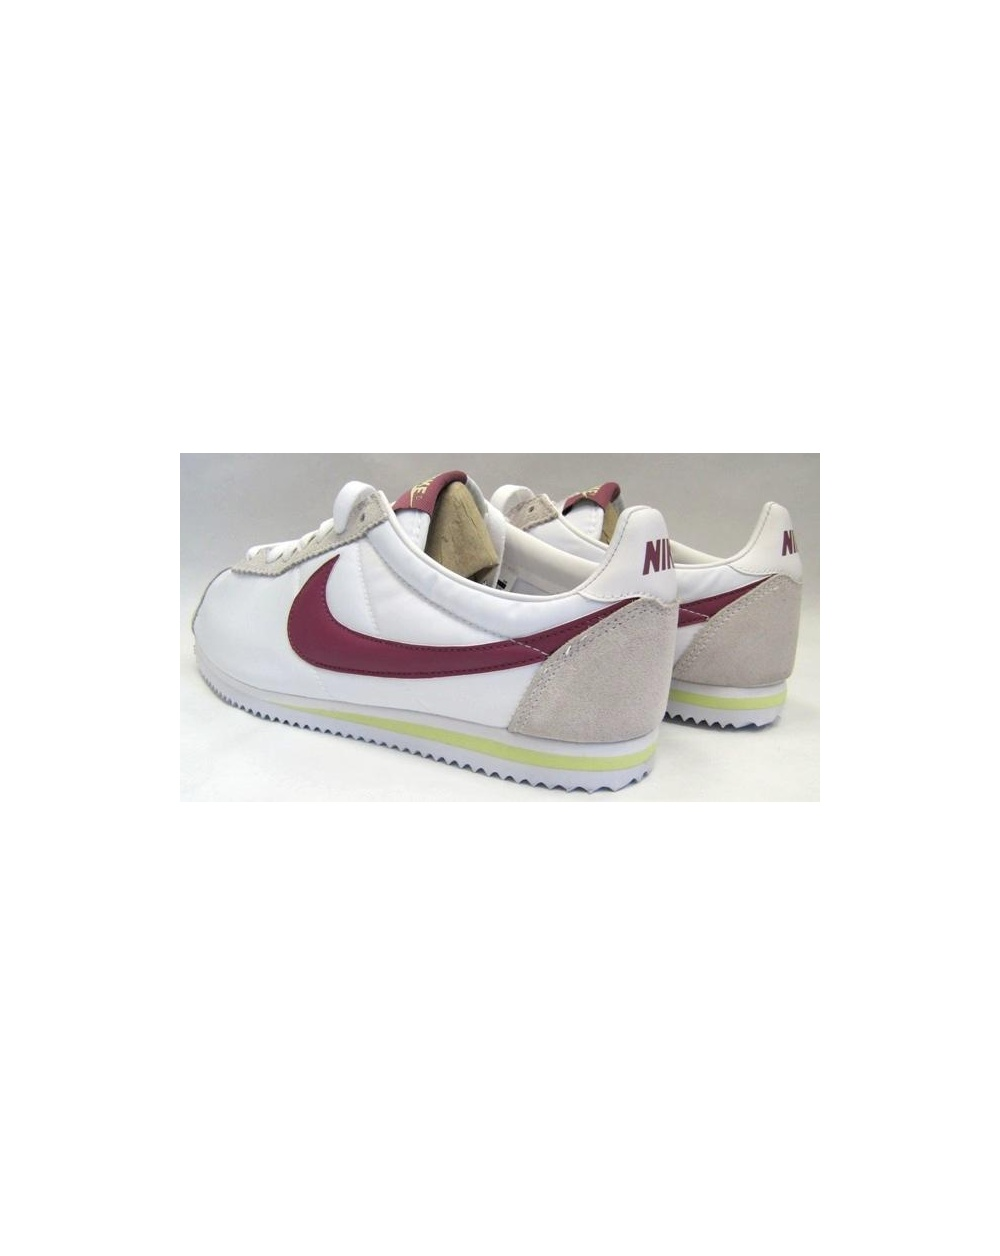 newest 92062 ec548 Nike Cortez Trainers Nylon White/maroon